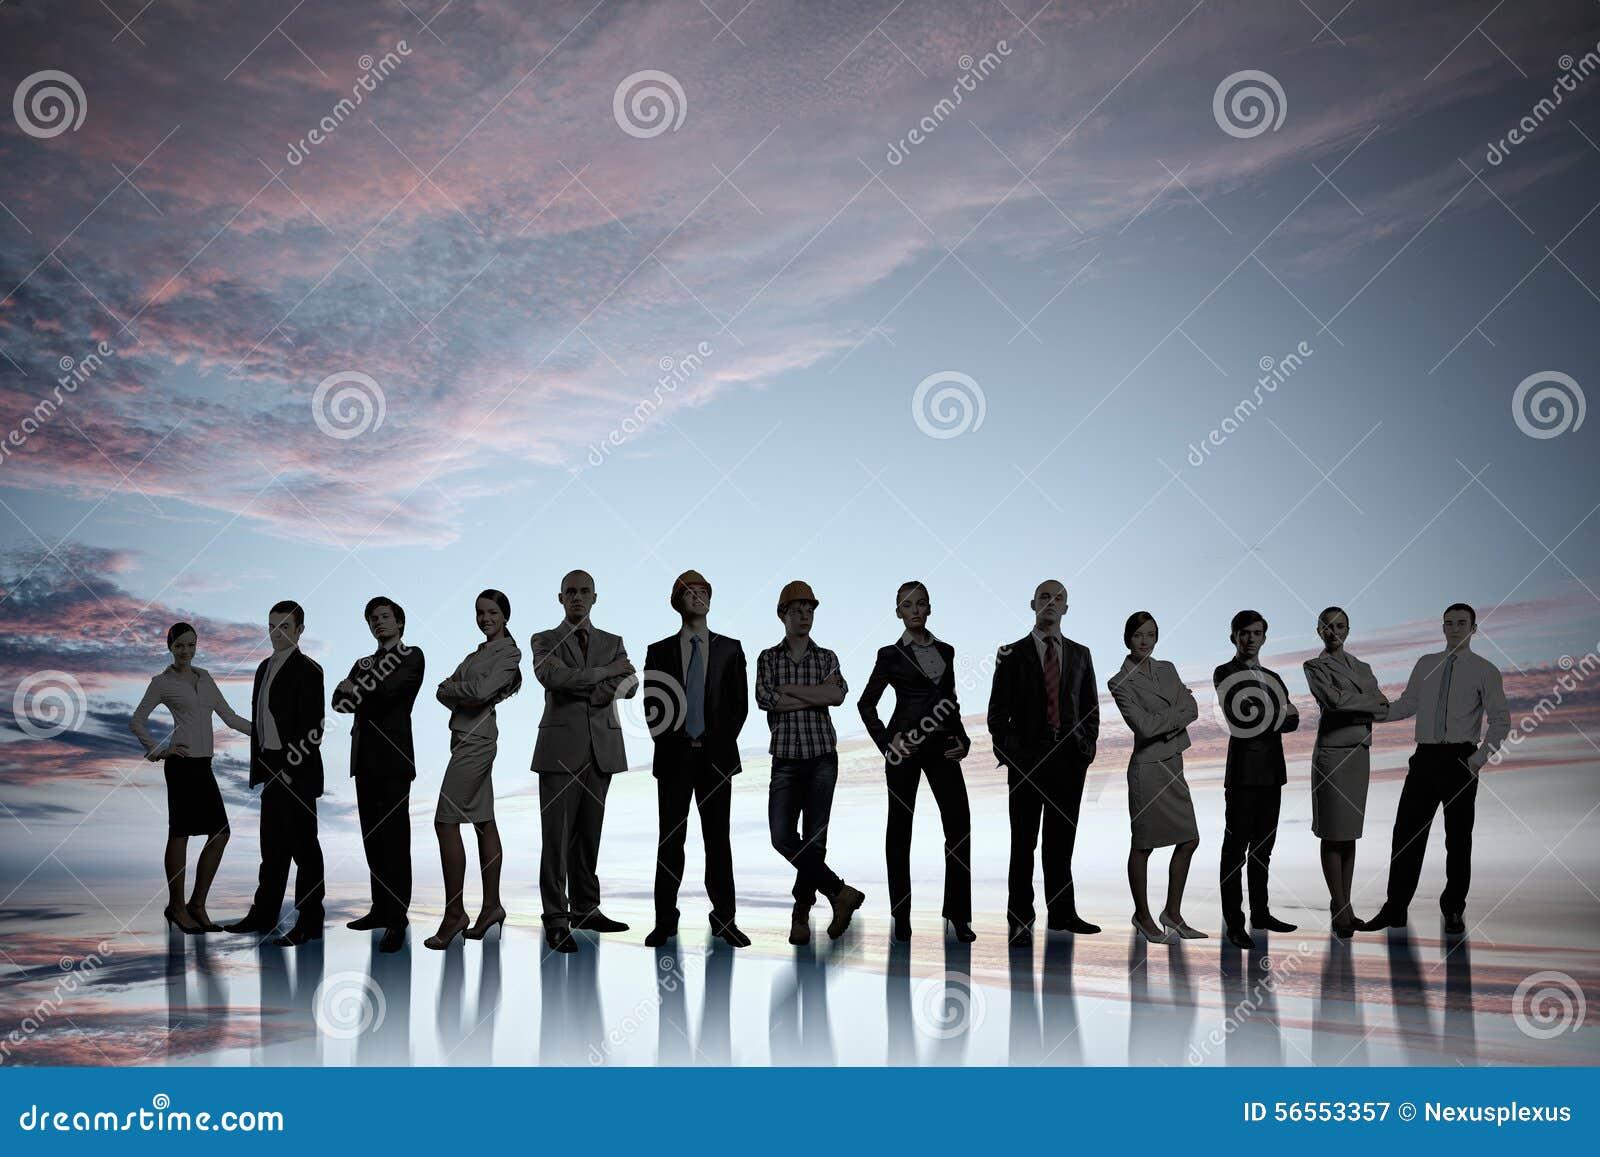 Download Είναι proffesionals στοκ εικόνα. εικόνα από ομάδα, επιχειρηματίας - 56553357